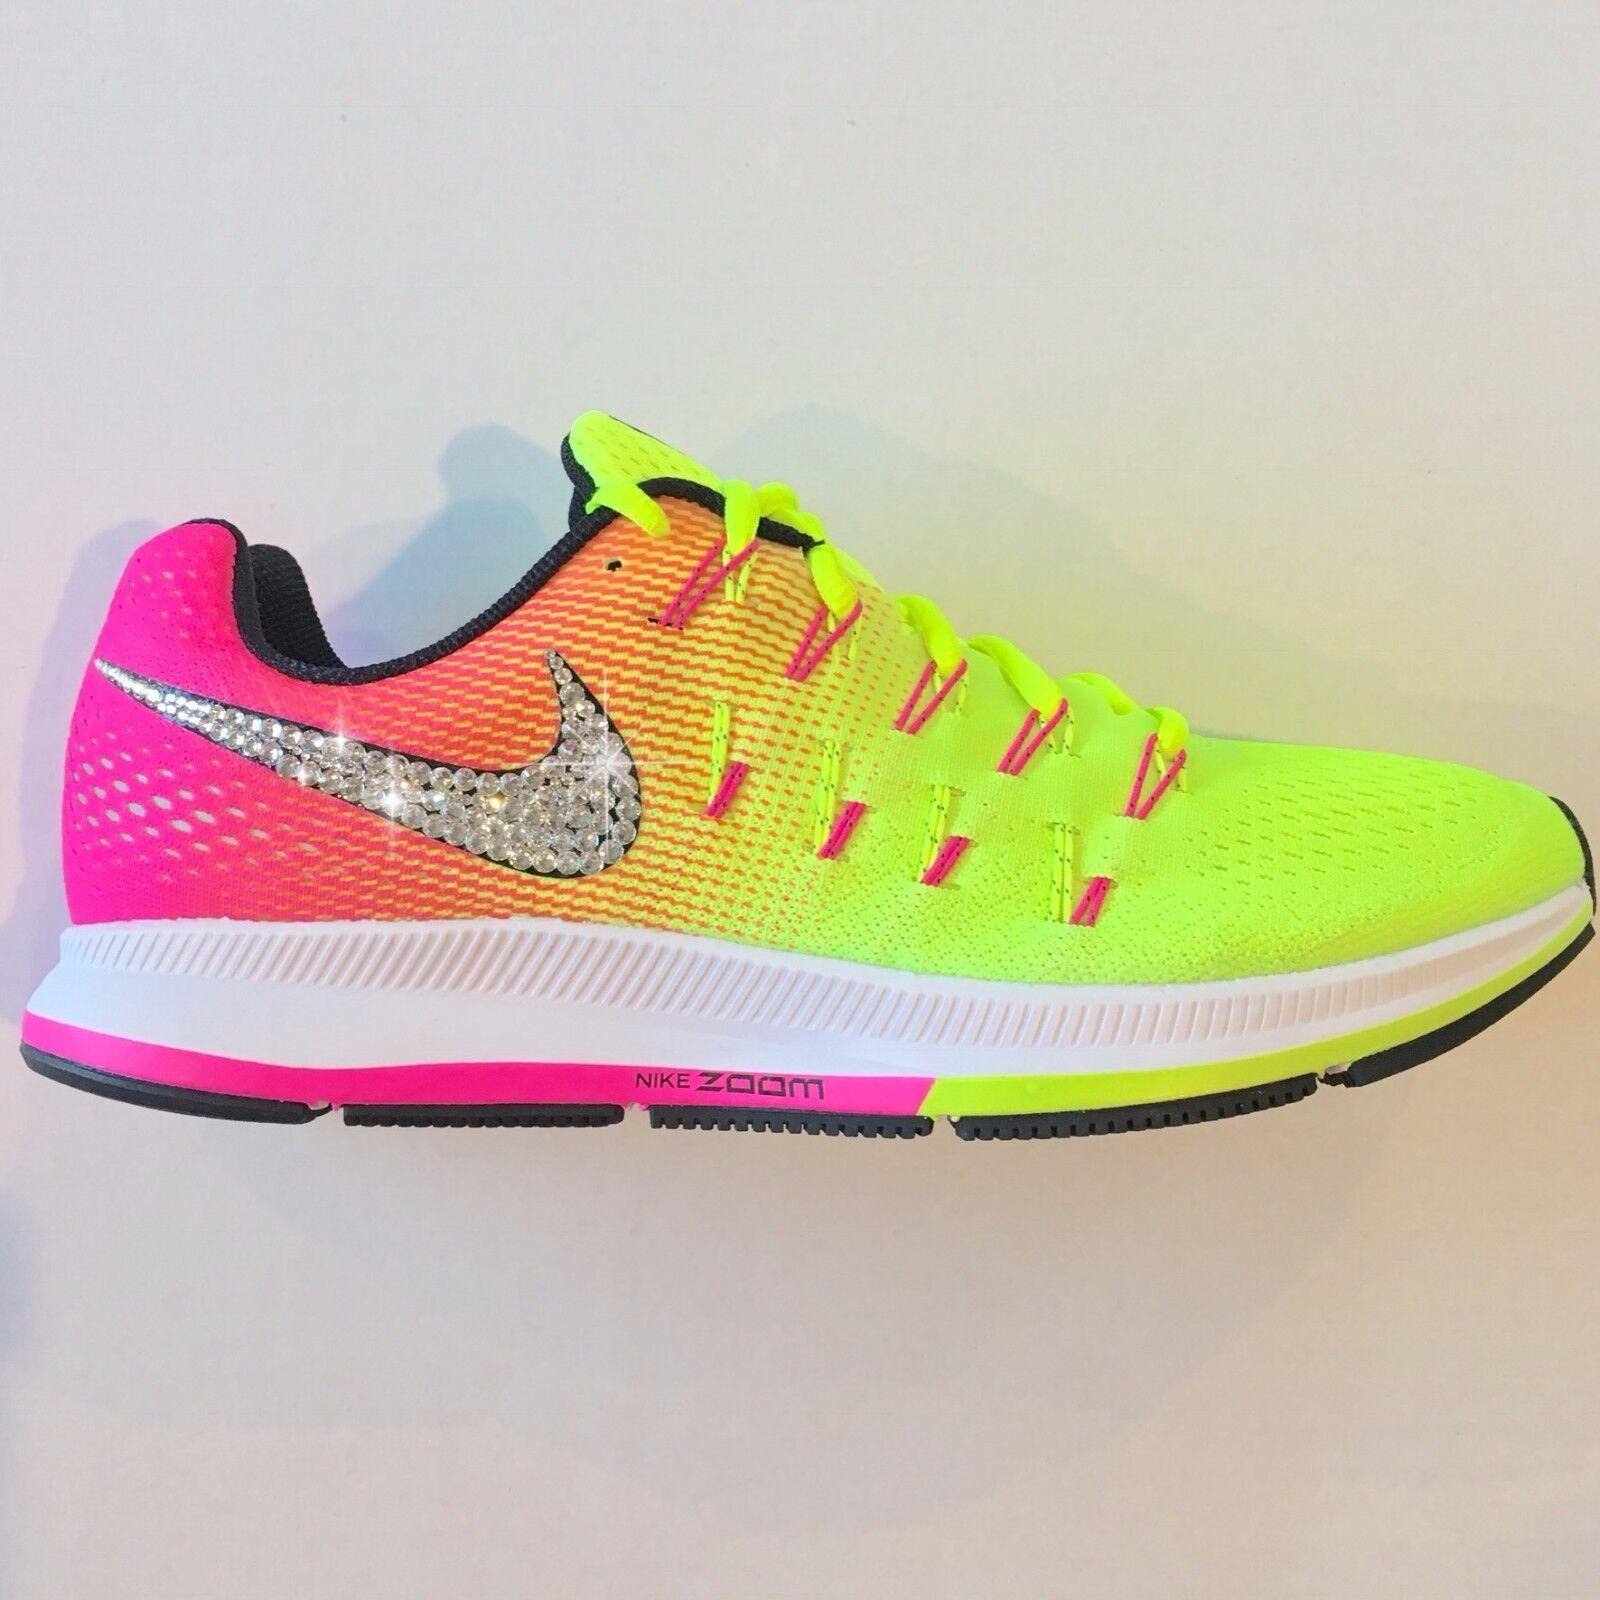 Bling Nike Shoes w/ Swarovski Crystals Air Zoom Pegasus 33 OC Olympic 2016 Multi